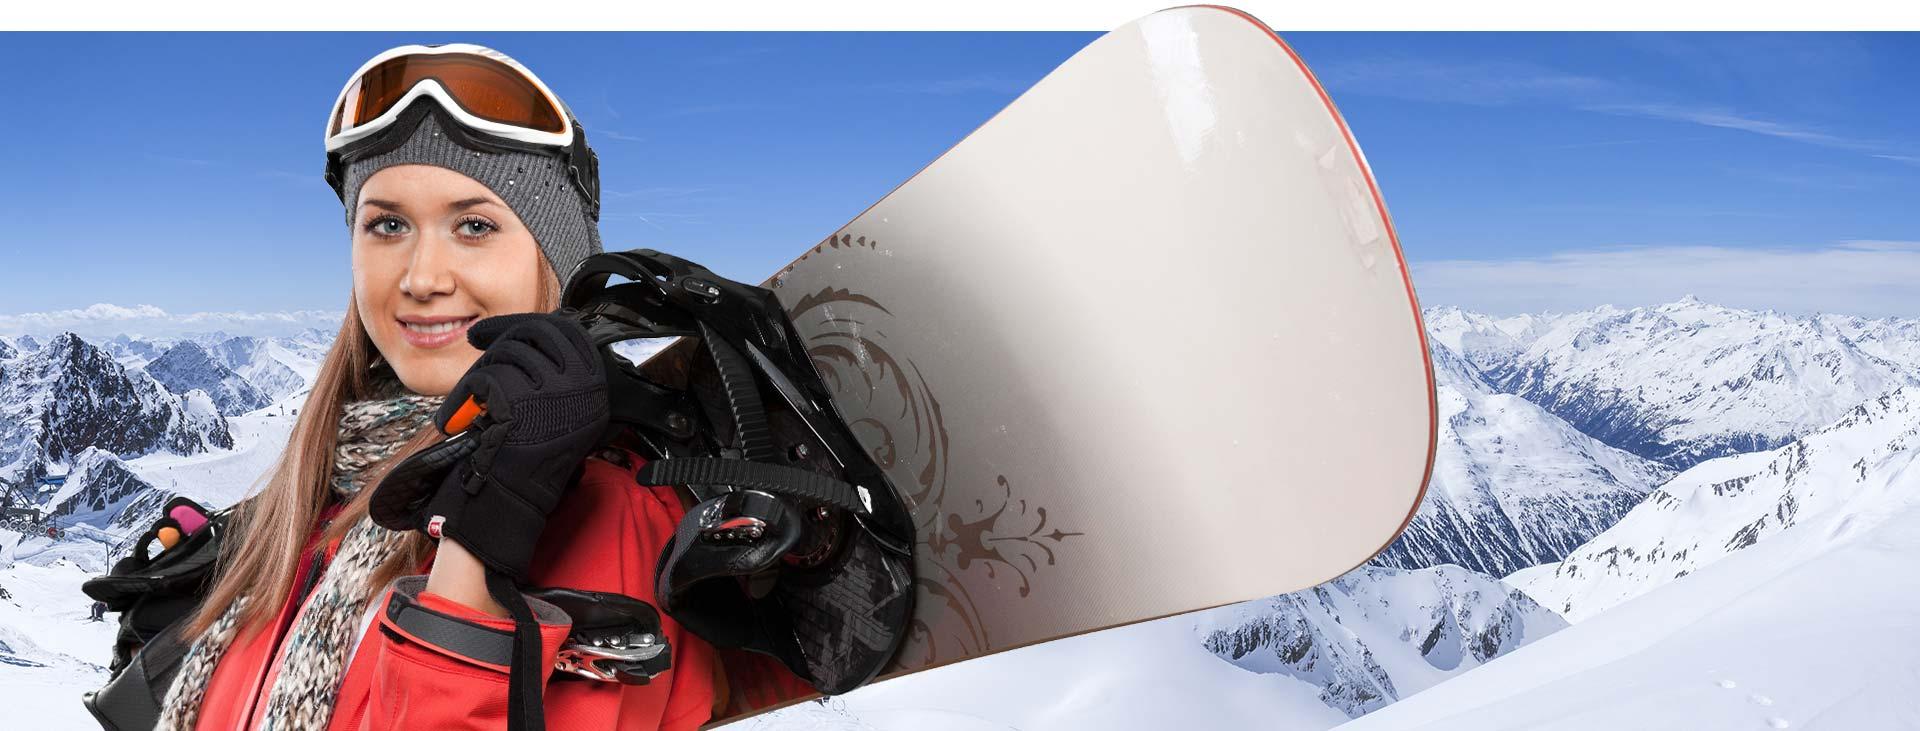 Snowboard Rental Shops in Federal Way and Kent, WA - Moxies